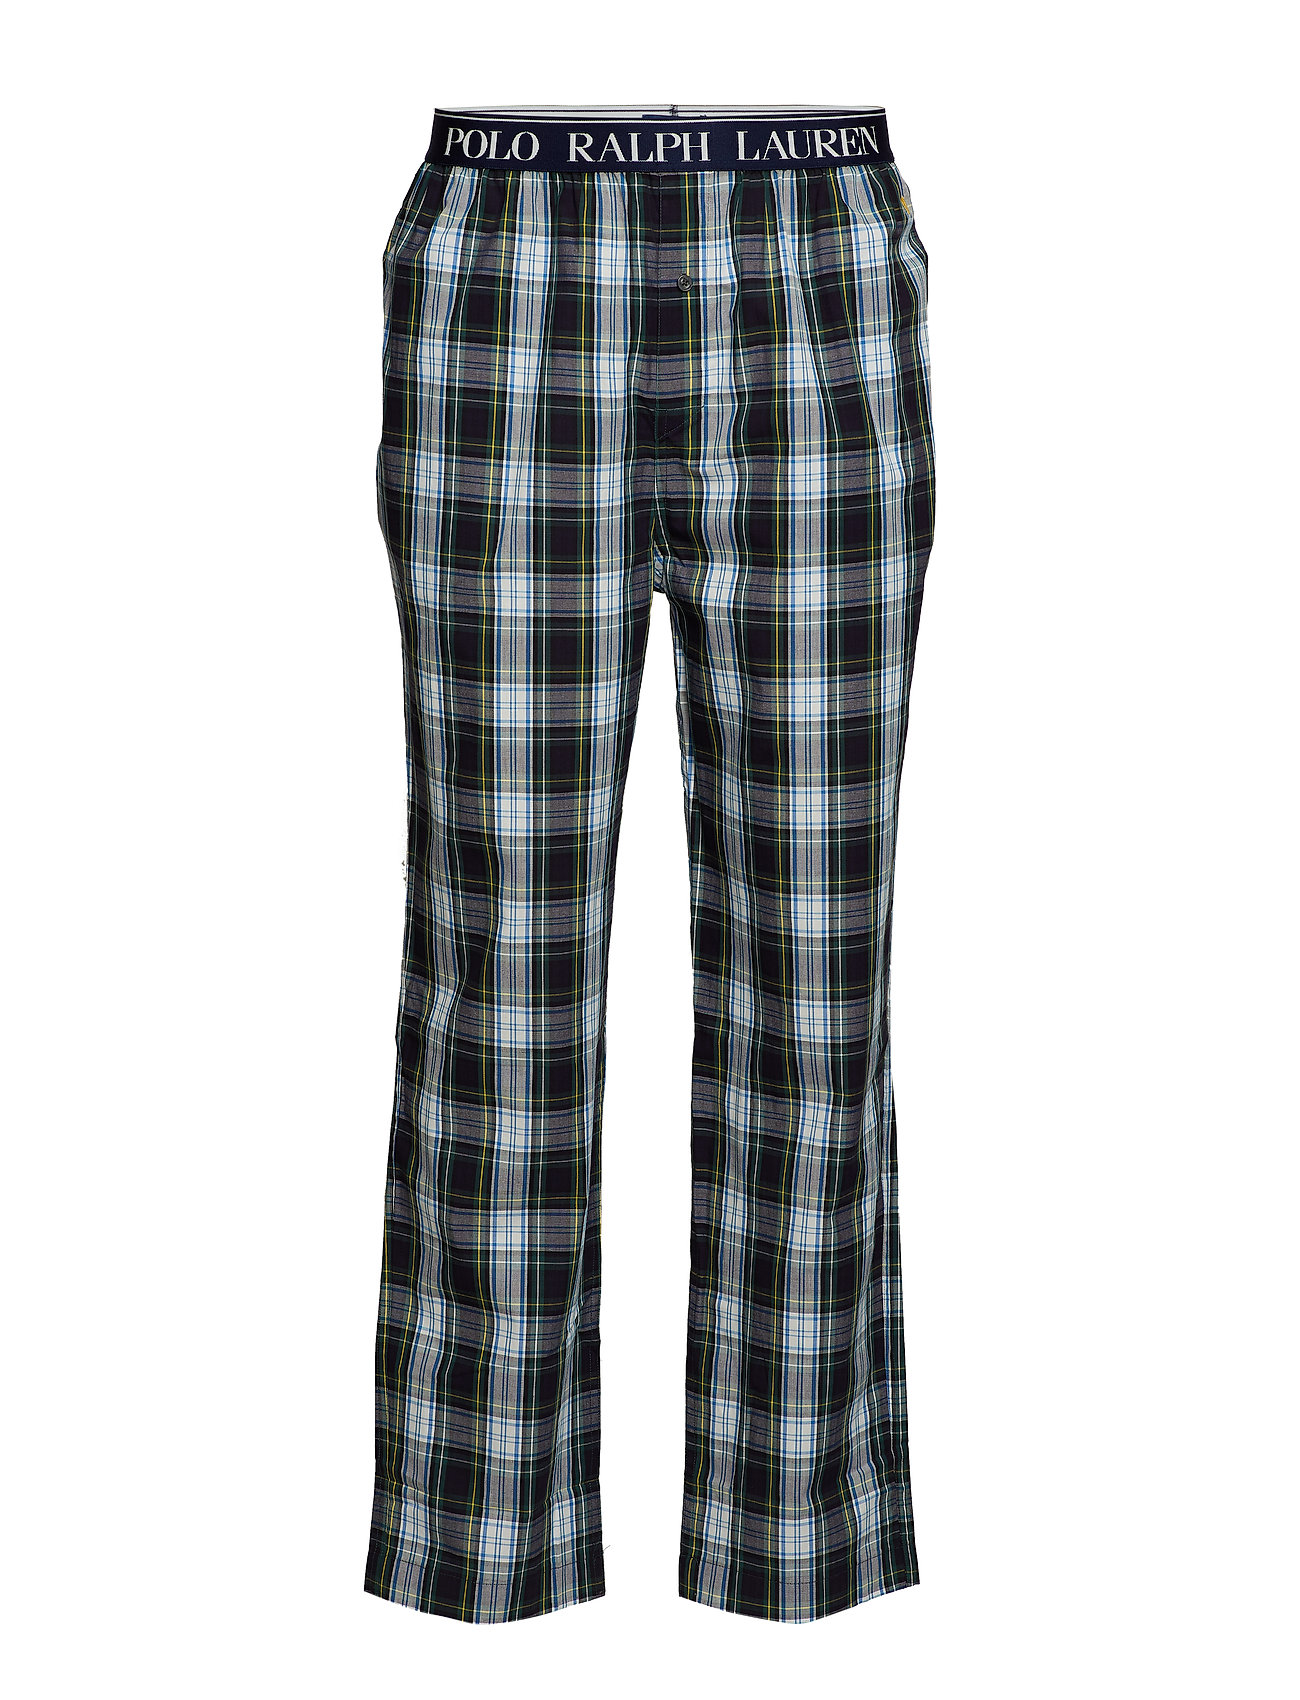 Polo Ralph Lauren Underwear Cotton Sleep Pant - WALES PLAID